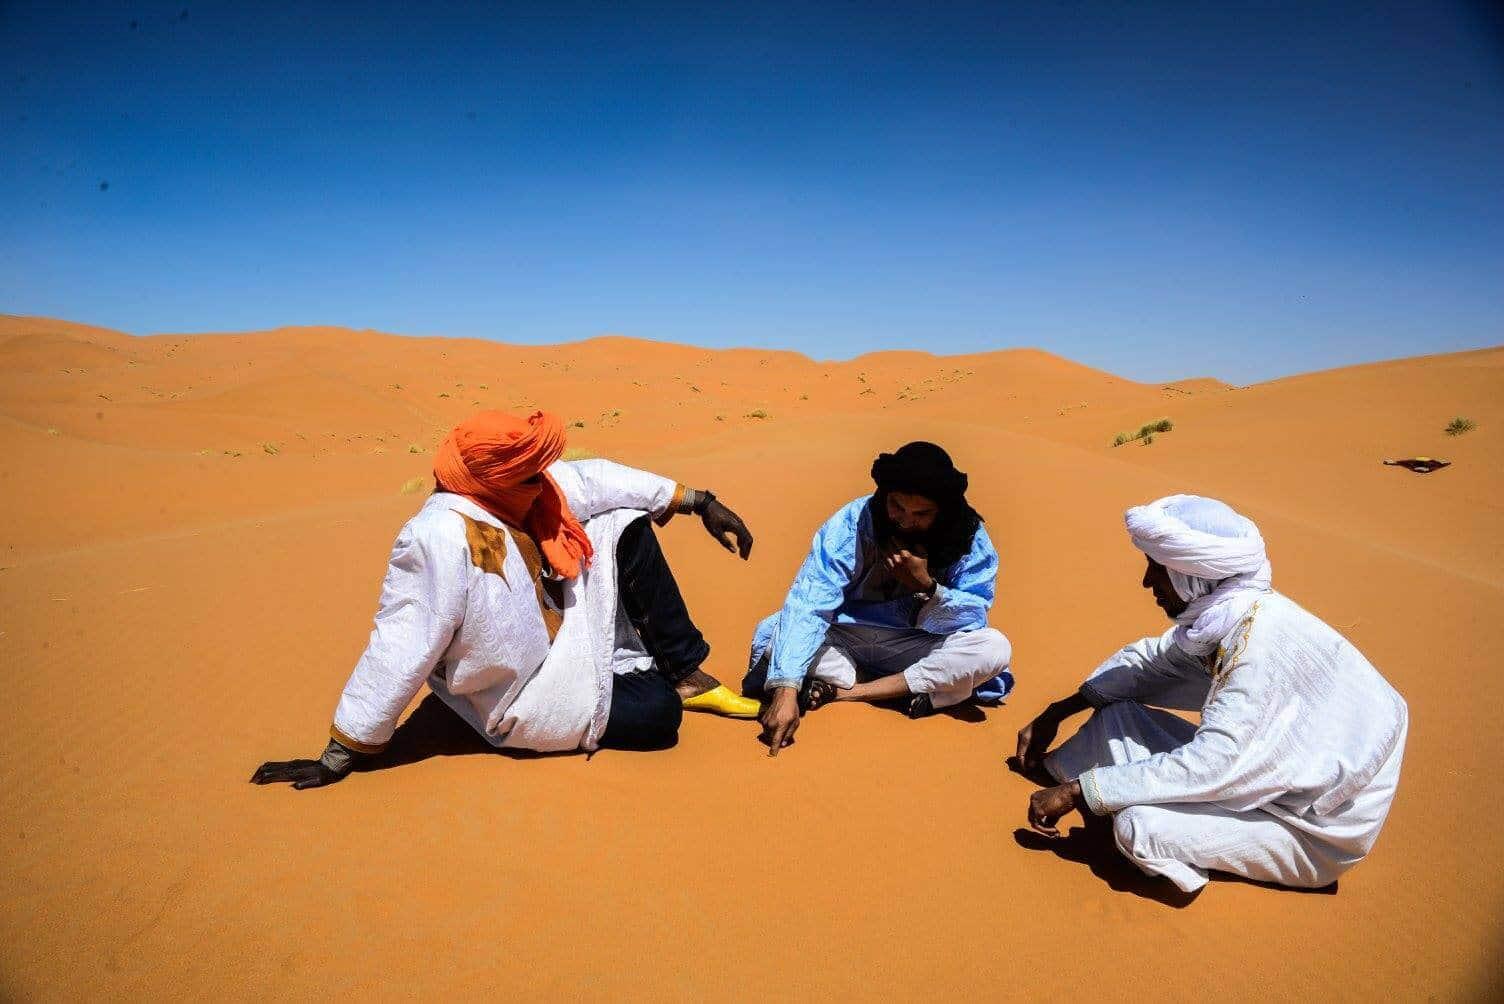 Desierto del Sahara en Marruecos